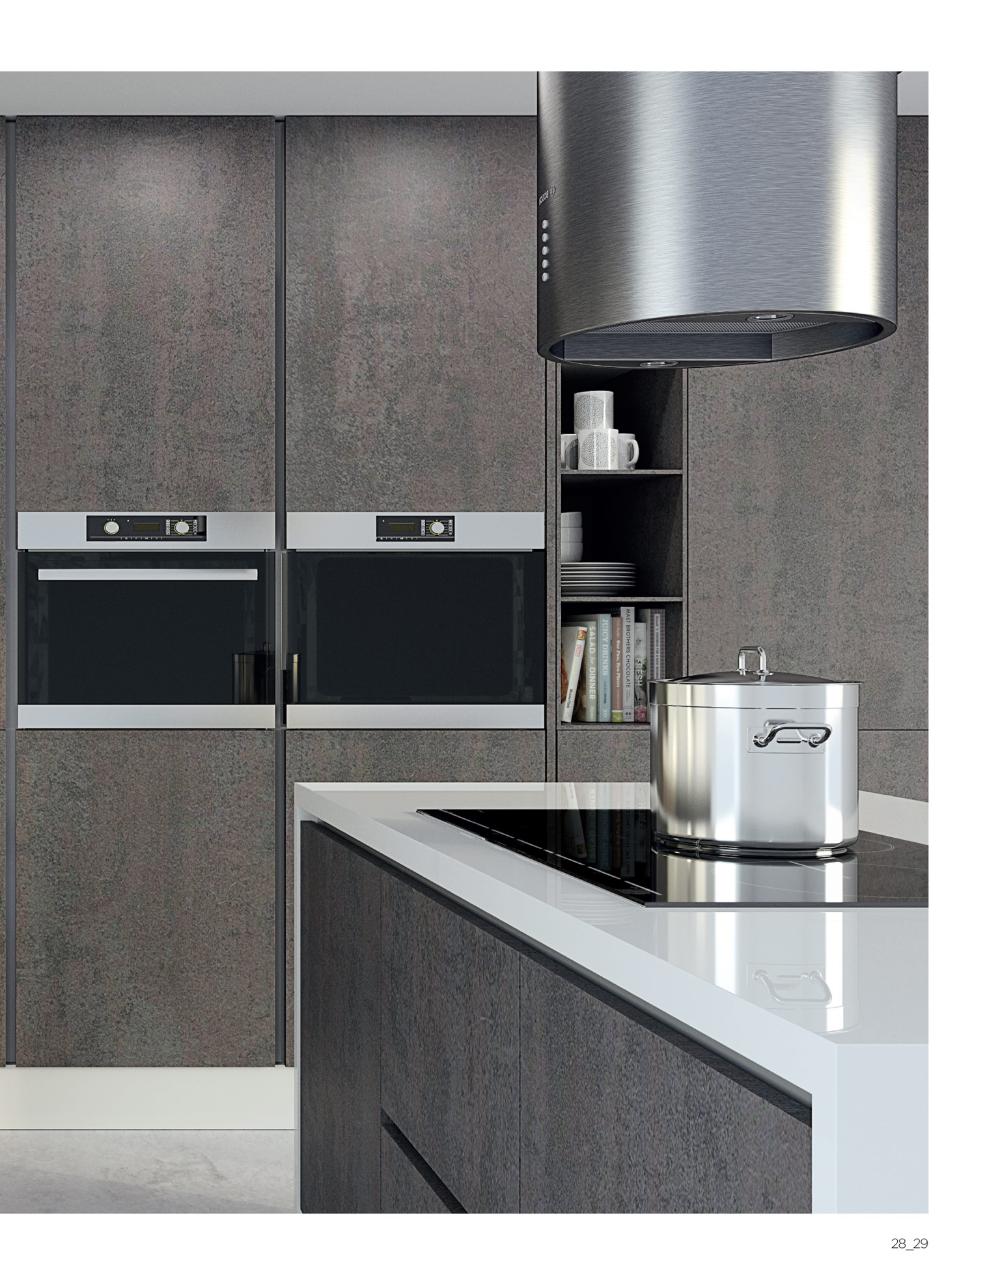 Kitchen Layout Design Tool: #kitchen Design Tool Ikea #farmhouse Kitchen Design #small